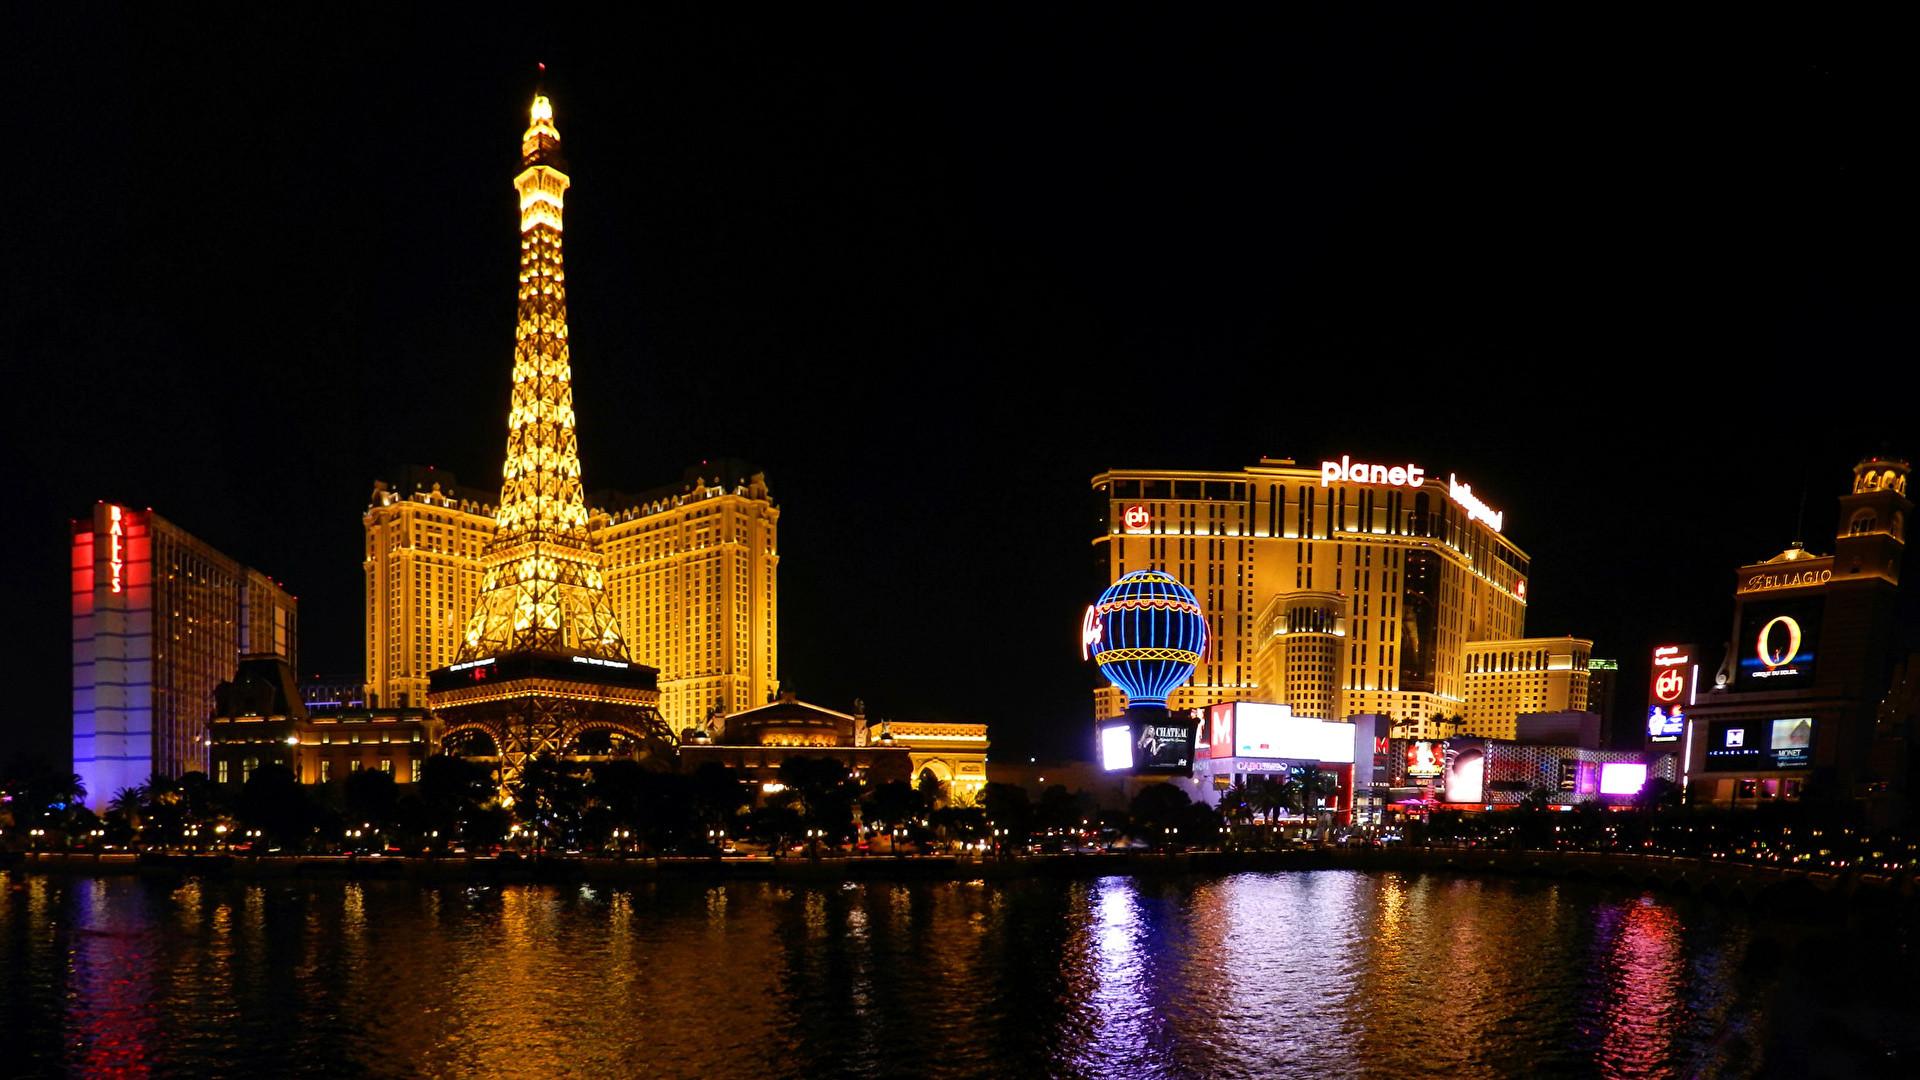 Wallpapers Las Vegas USA Rivers night time Cities Building Night  Houses